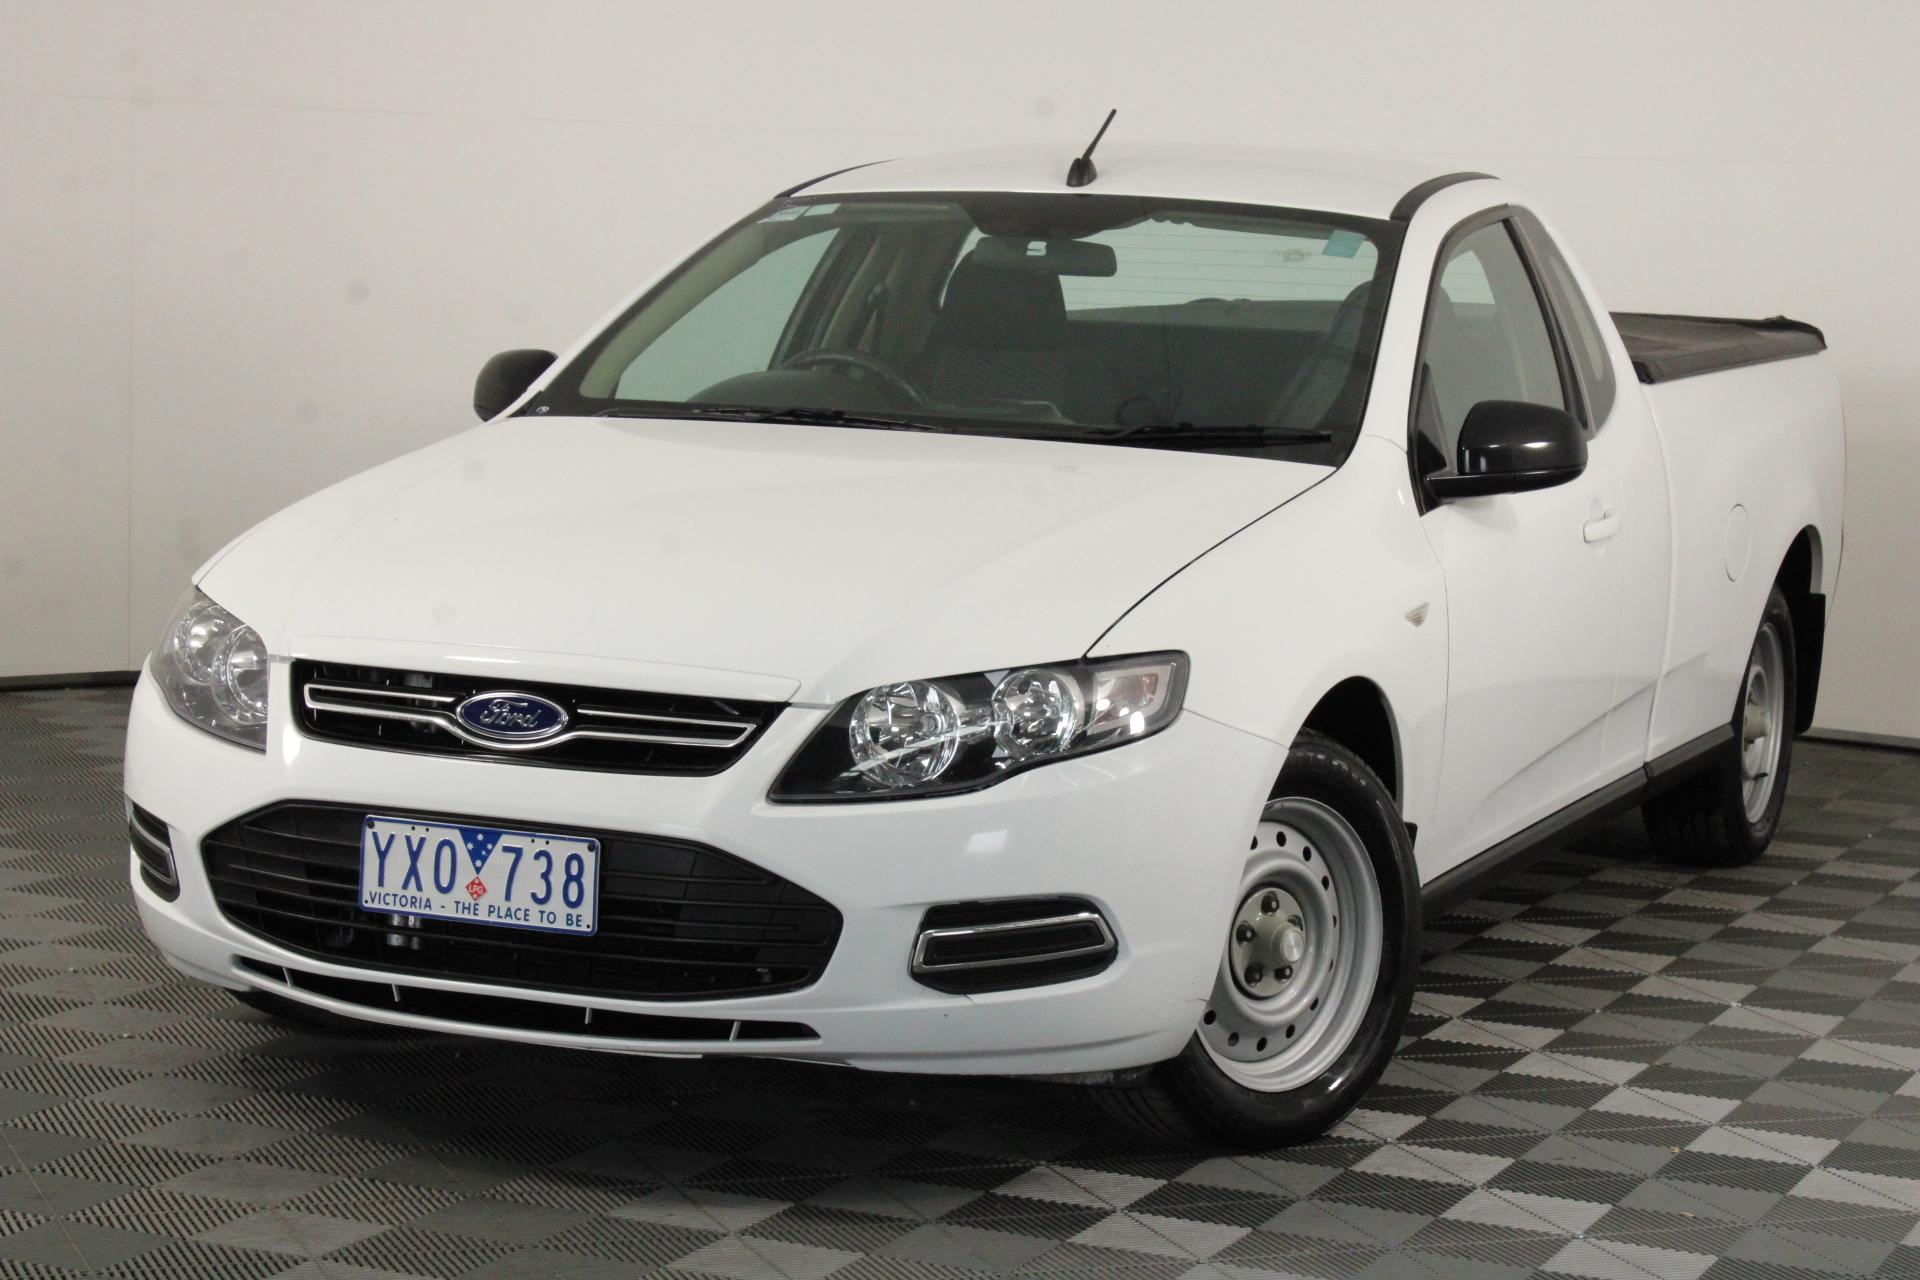 2012 Ford Falcon (LPI) FG II Automatic Ute (EX GOV)